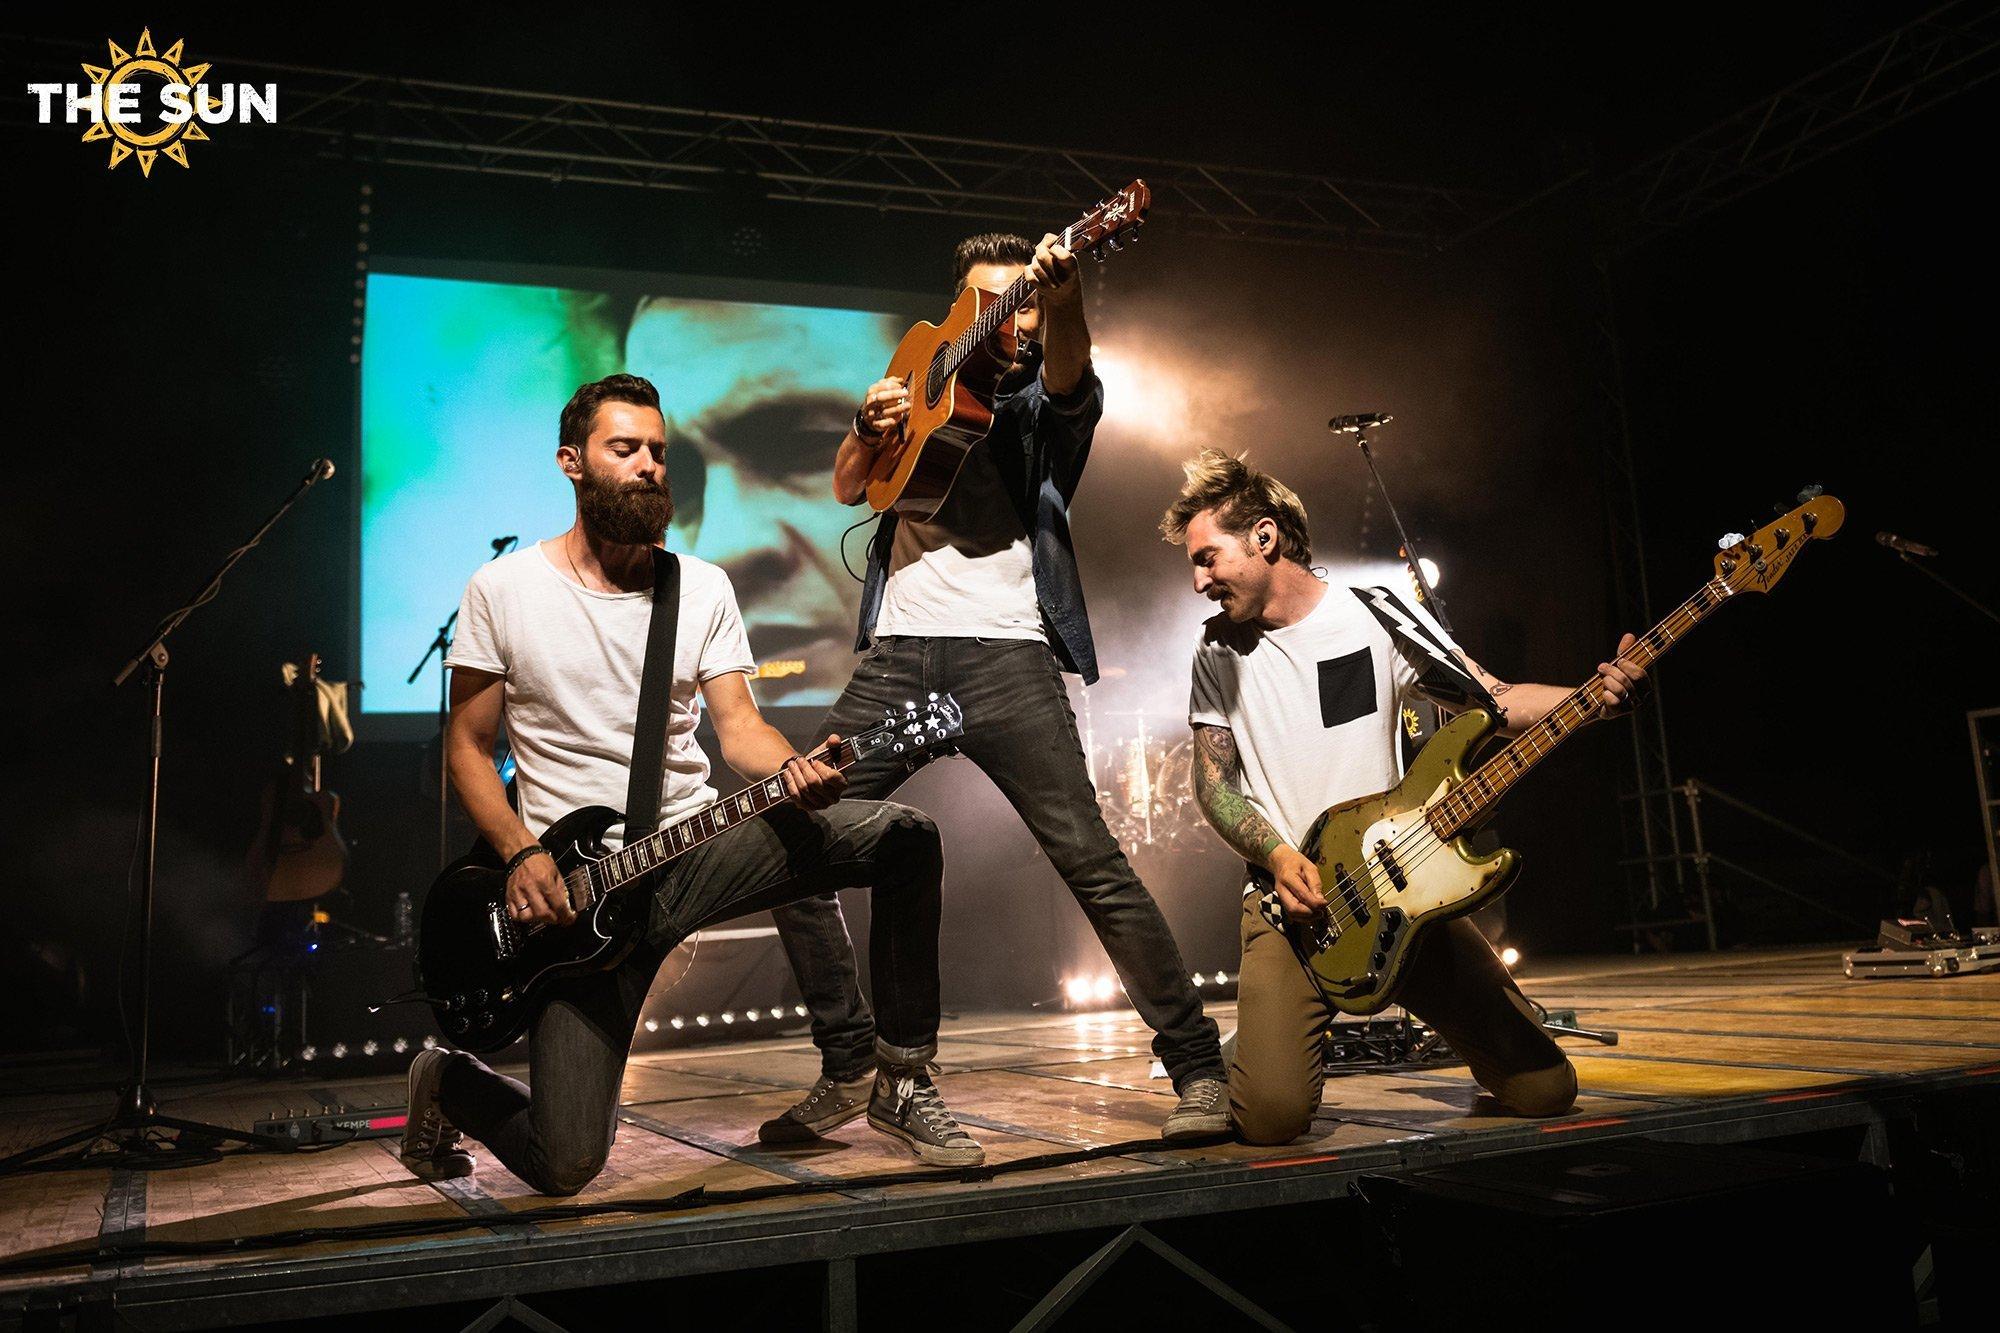 the sun rock band live villafranca padovana concerto